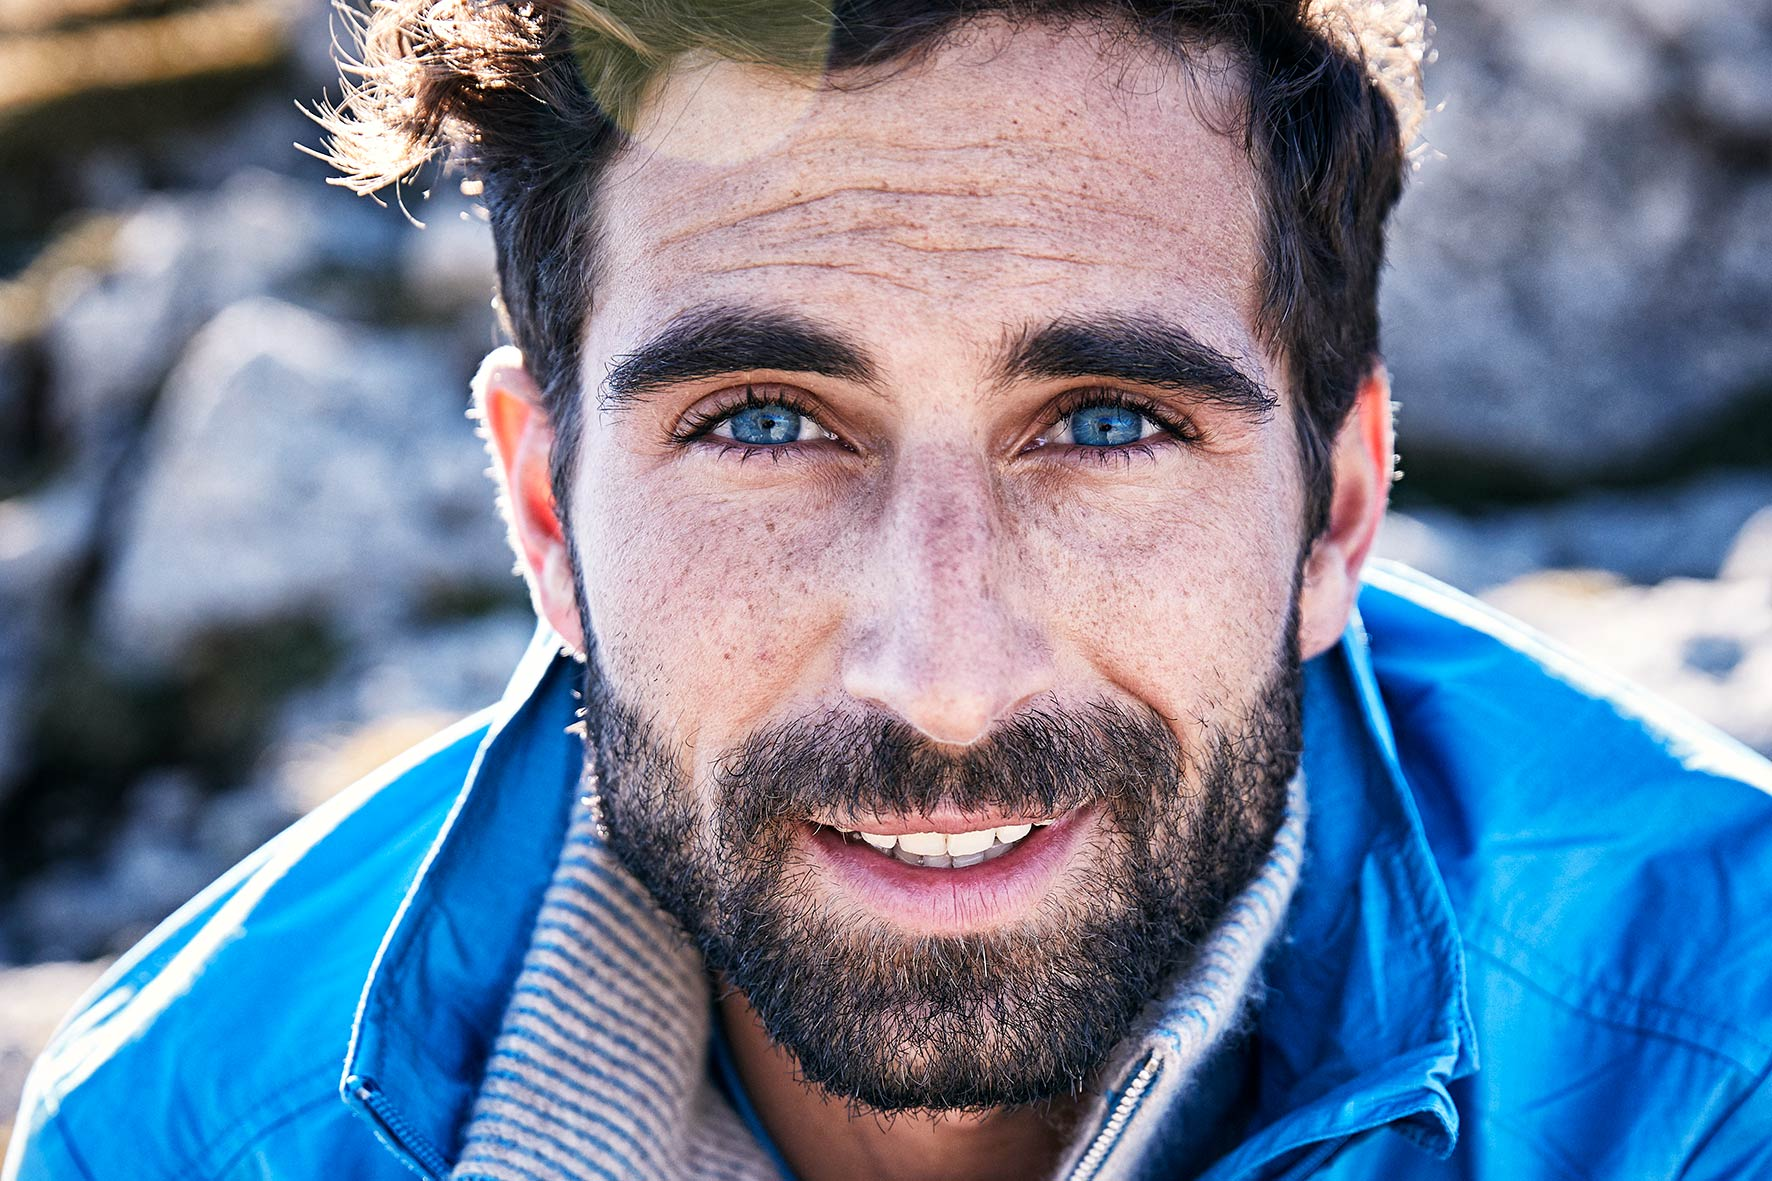 Mountain climber looks into the camera